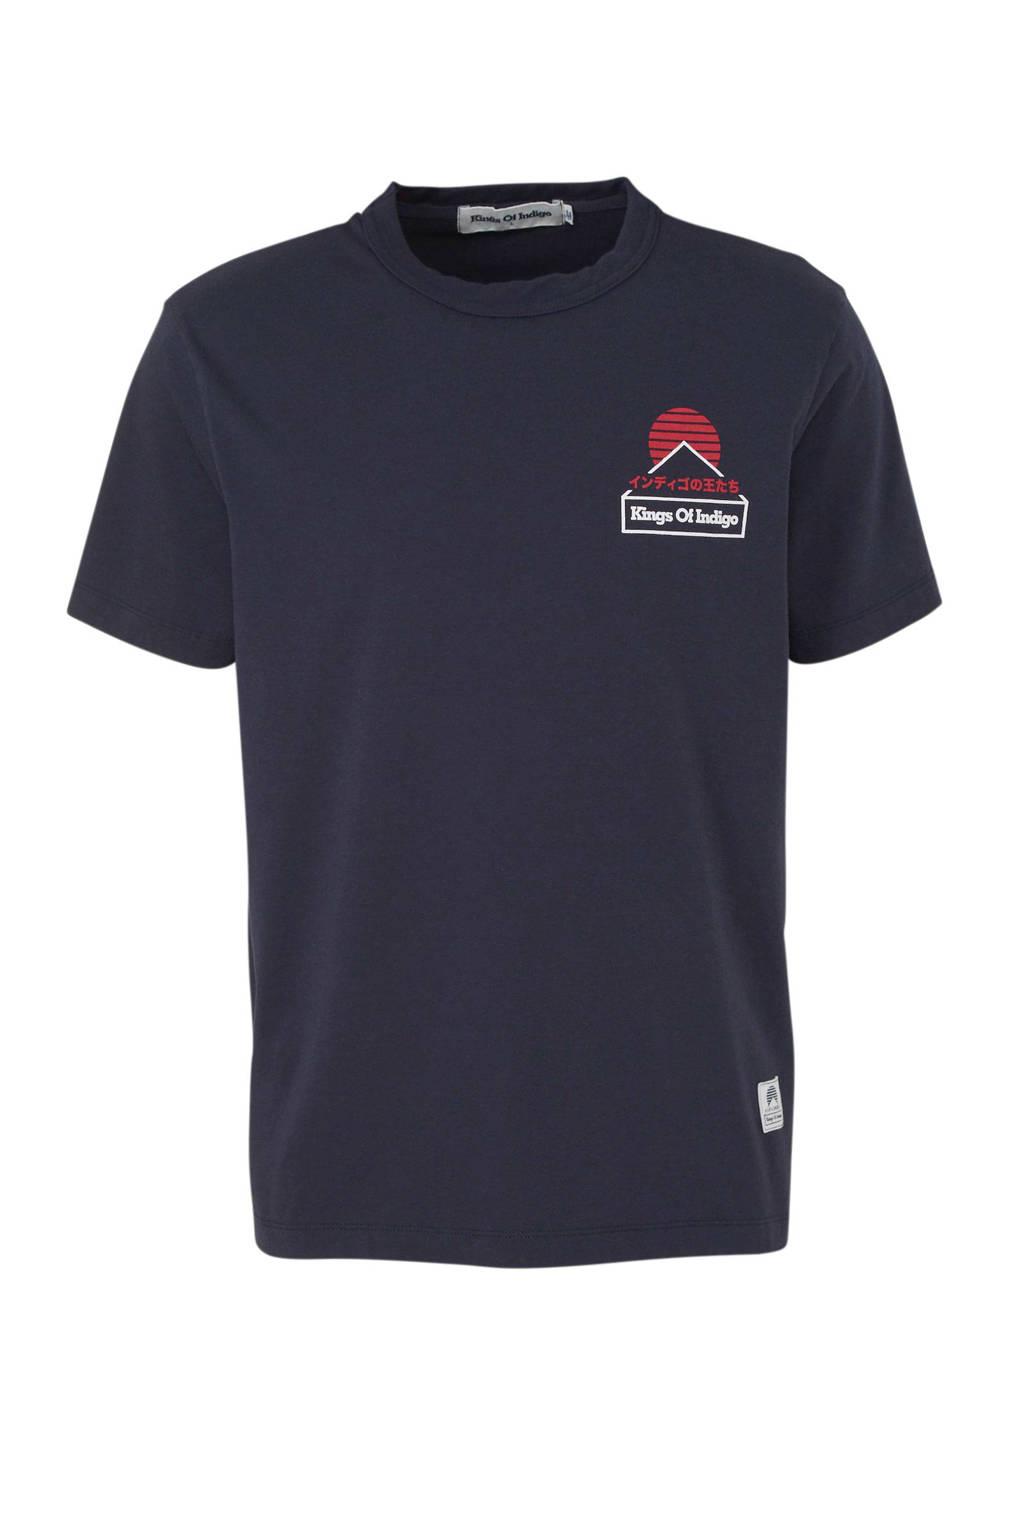 Kings of Indigo T-shirt van biologisch katoen marine, Marine